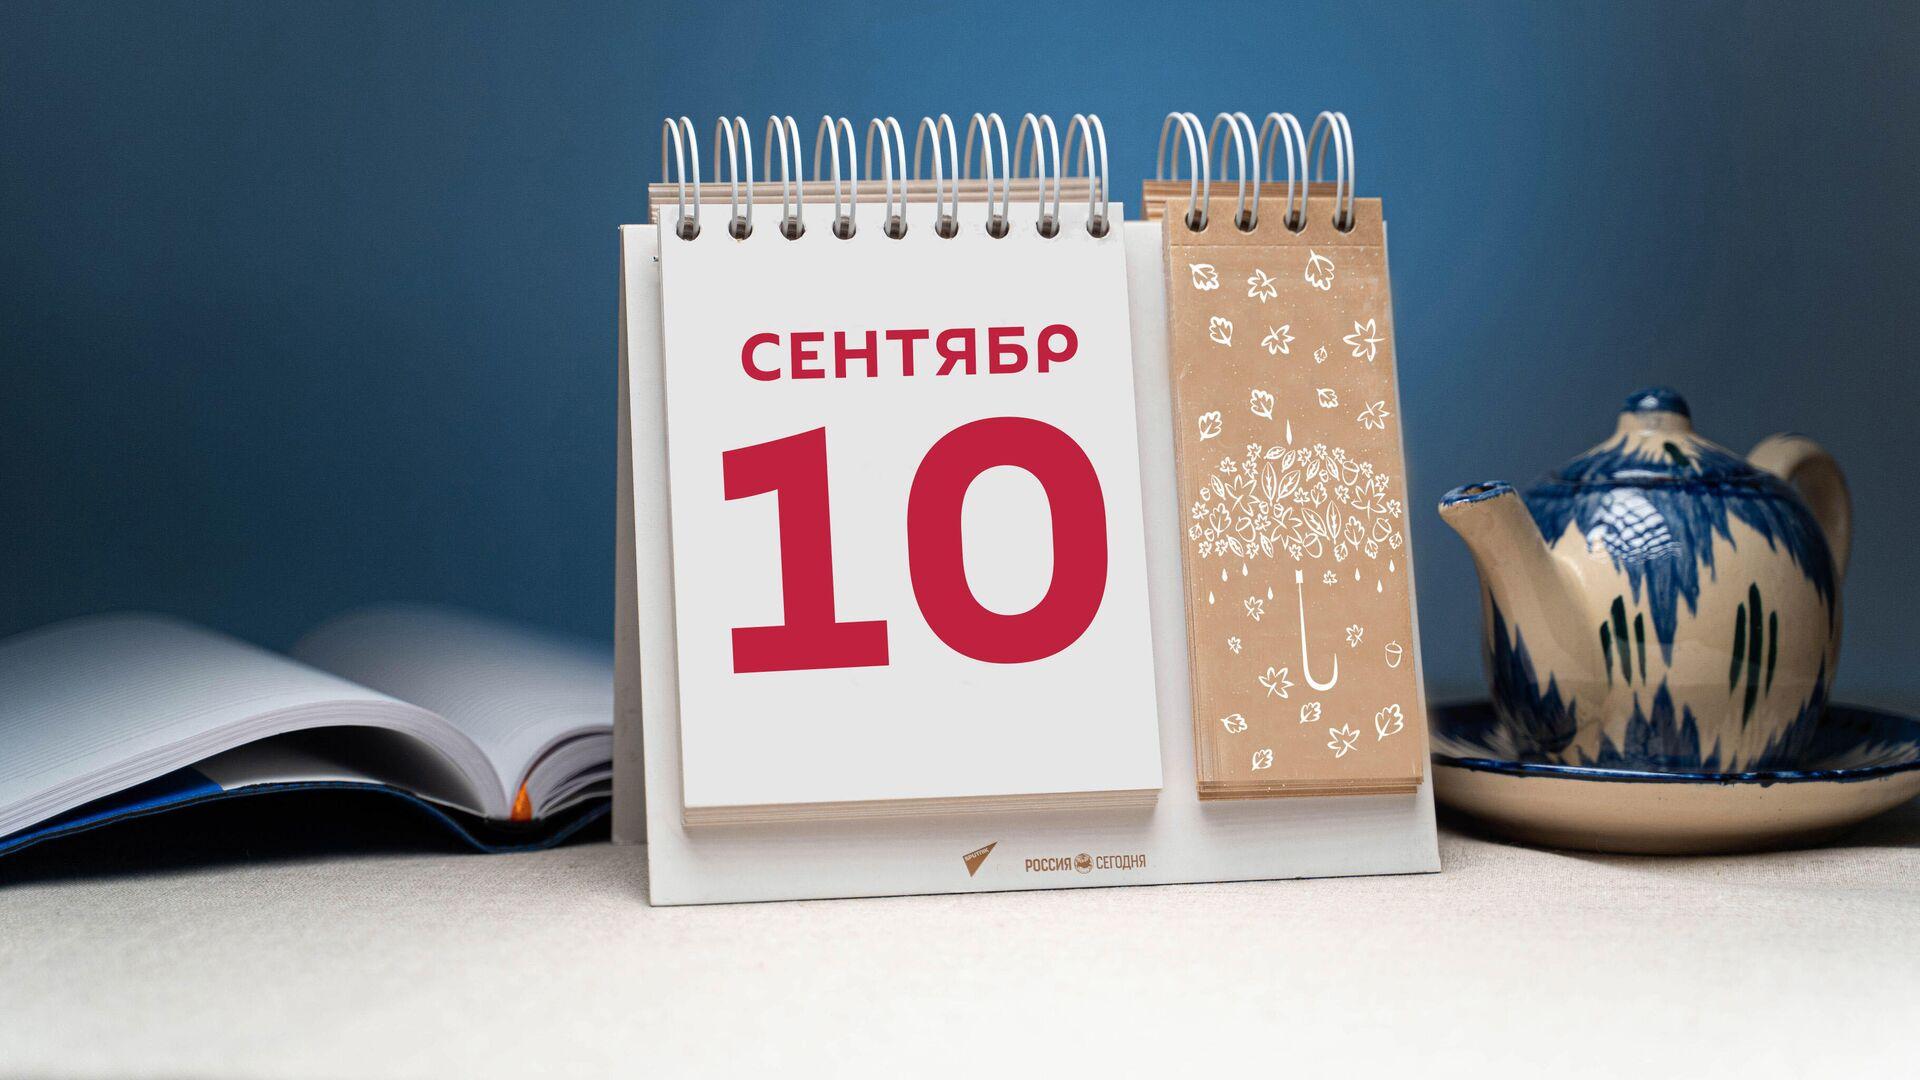 День 10 сентября - Sputnik Тоҷикистон, 1920, 10.09.2021